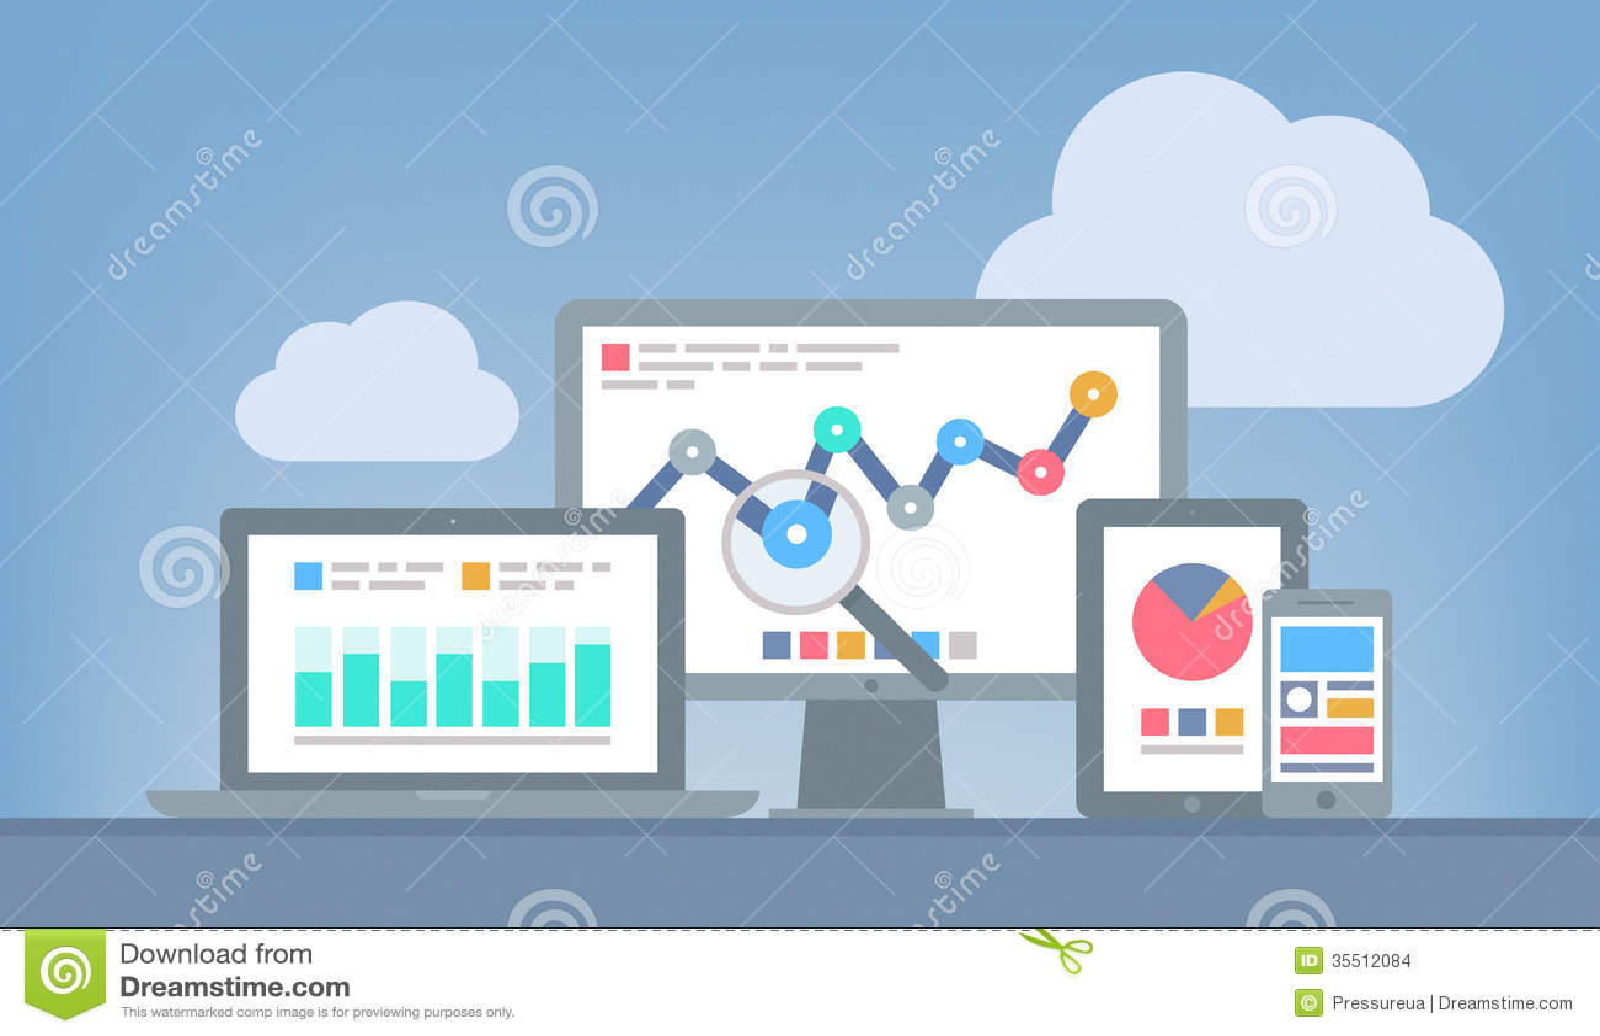 seo监控_seo数据监控_数据监控网站